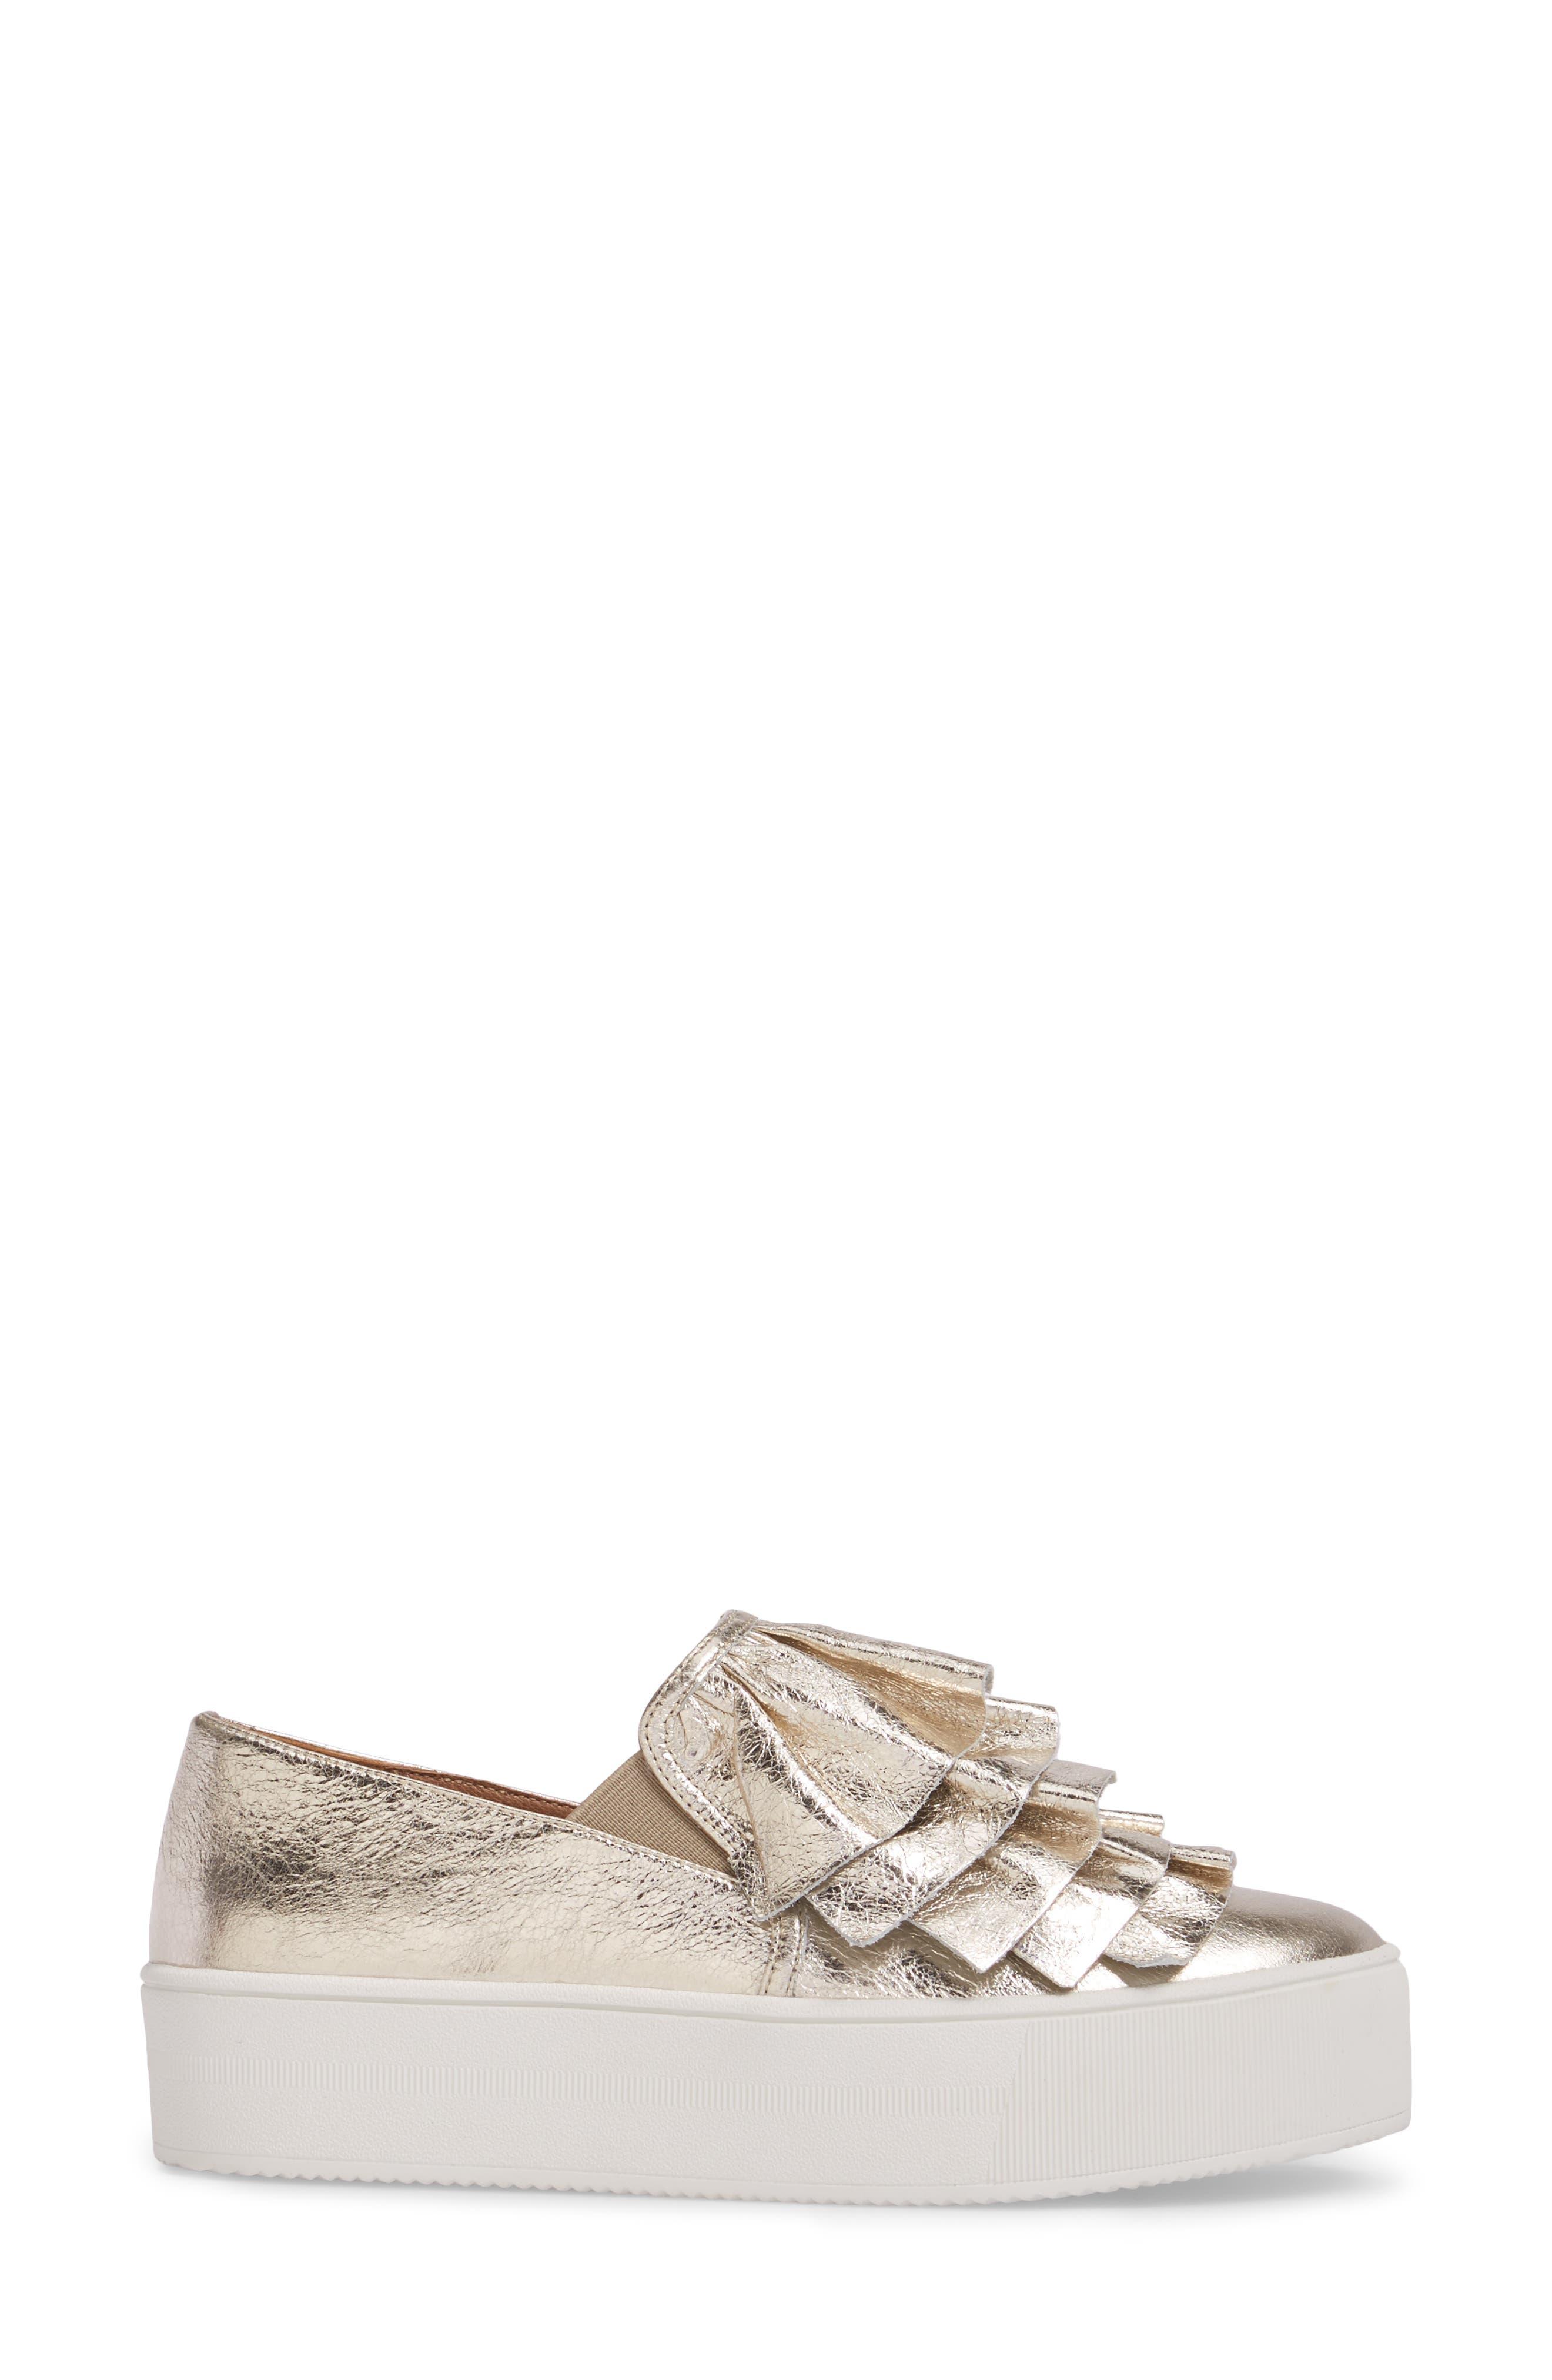 Marian Platform Sneaker,                             Alternate thumbnail 3, color,                             Gold Leather